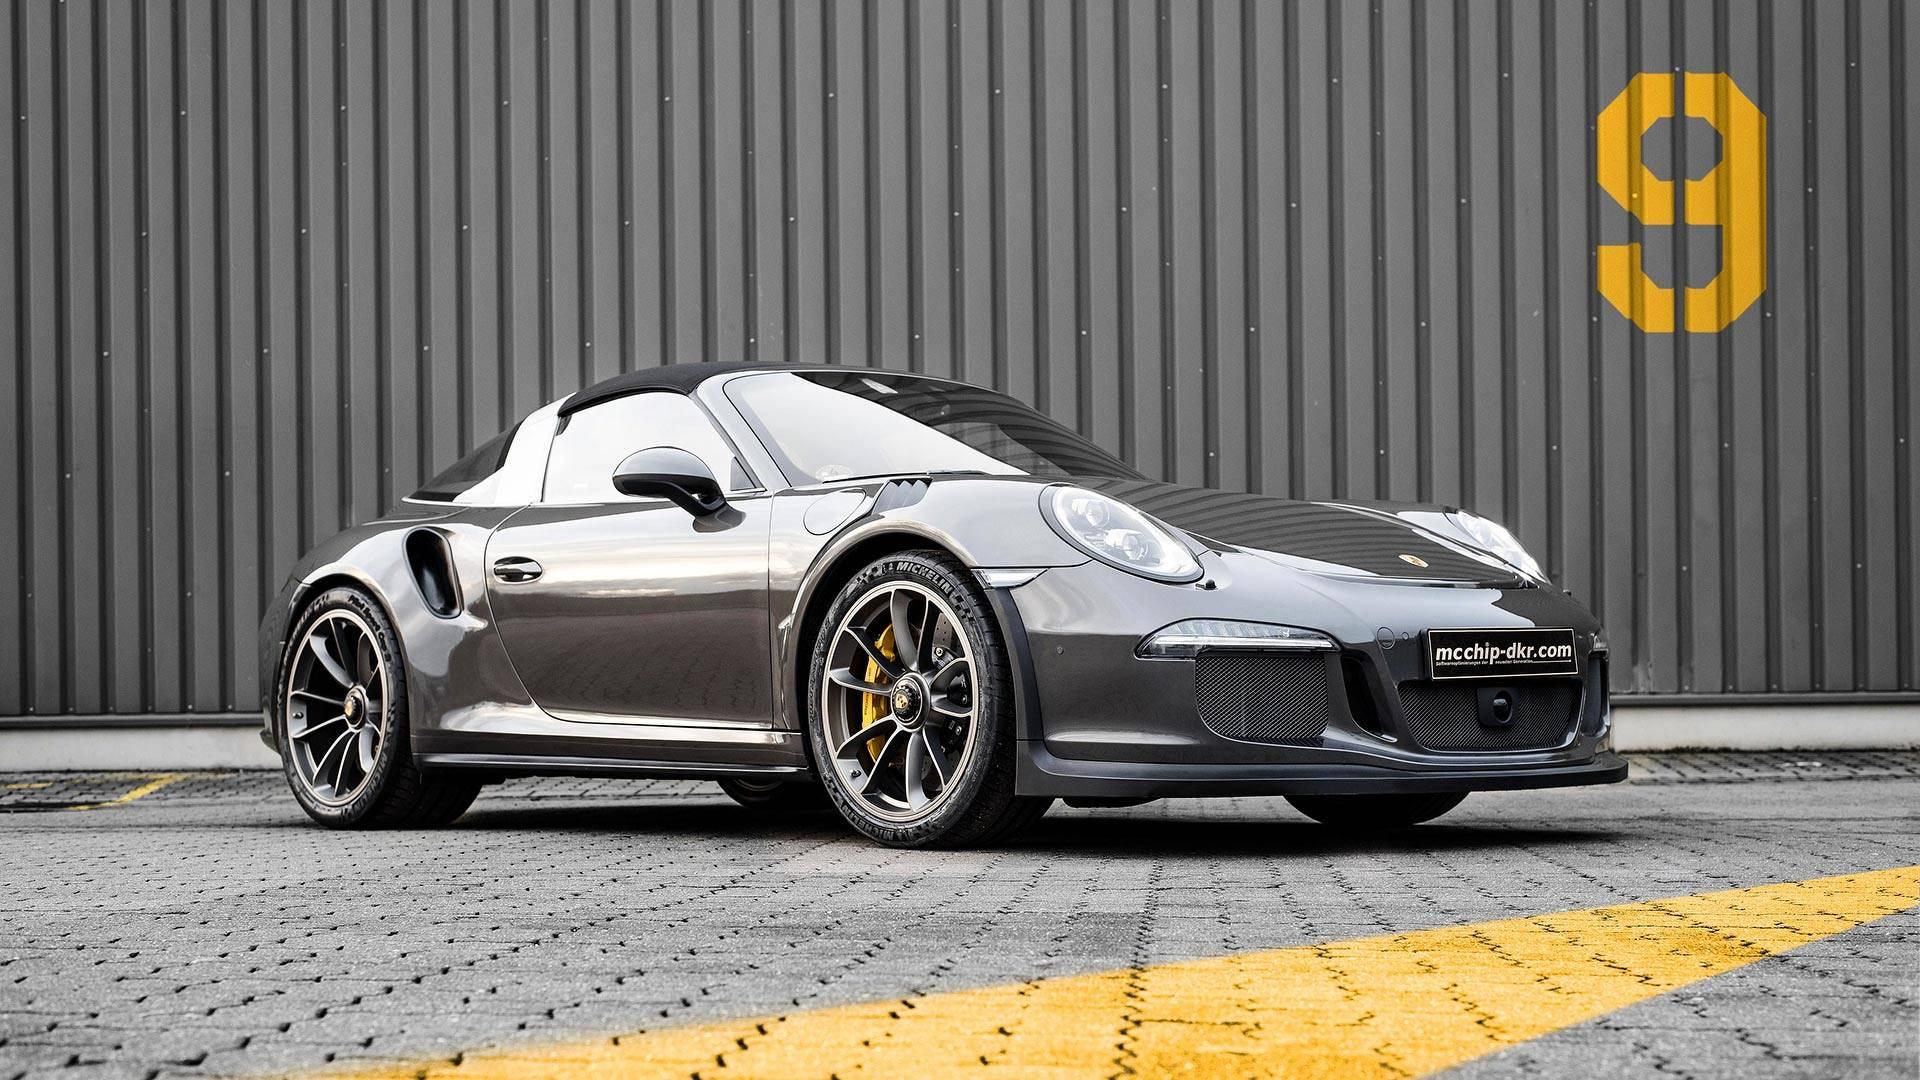 Porsche_911_Targa_GT3_by_Mcchip-dkr_0001